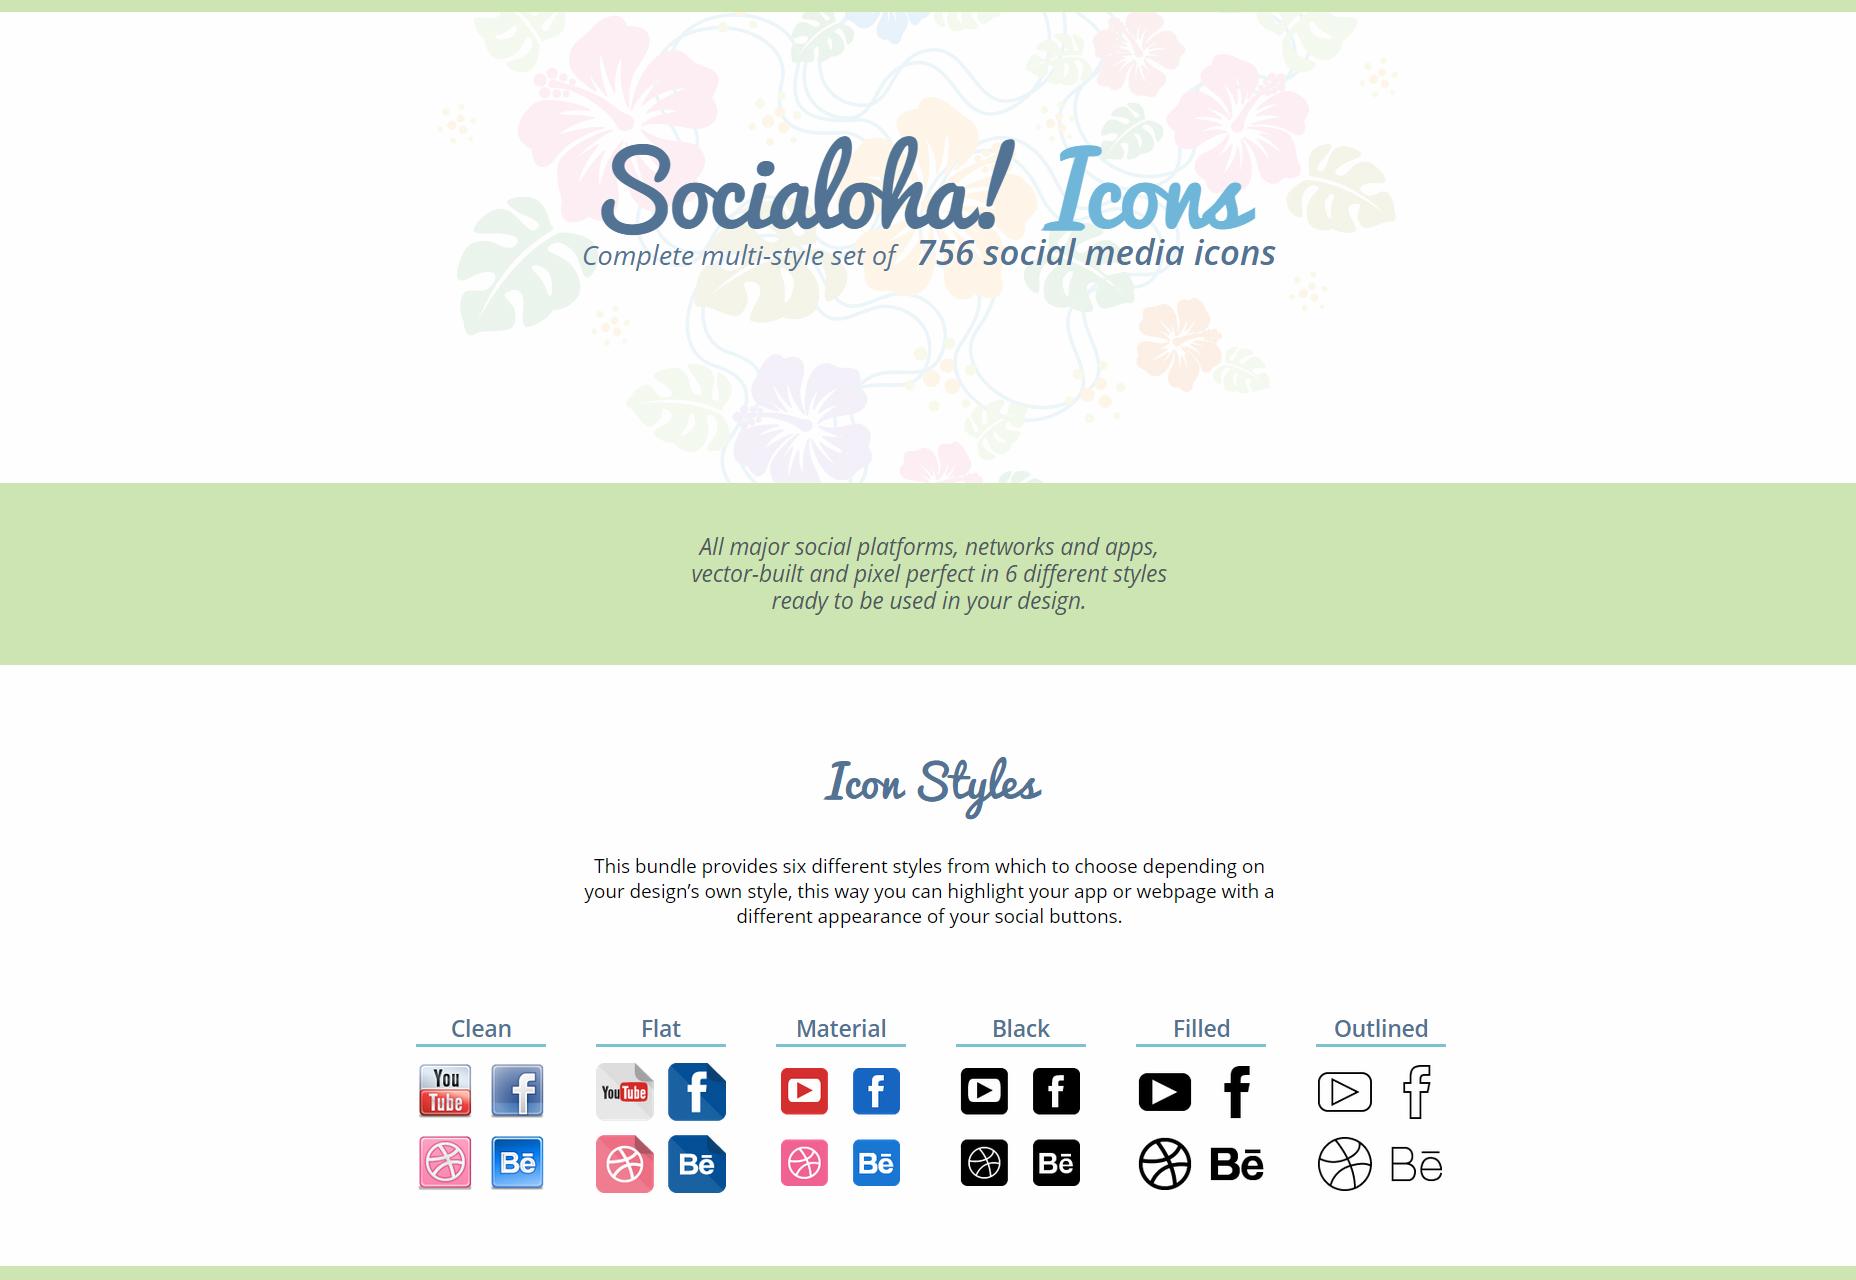 Socialoha: Een set van 756 multi-stijl sociale pictogrammen